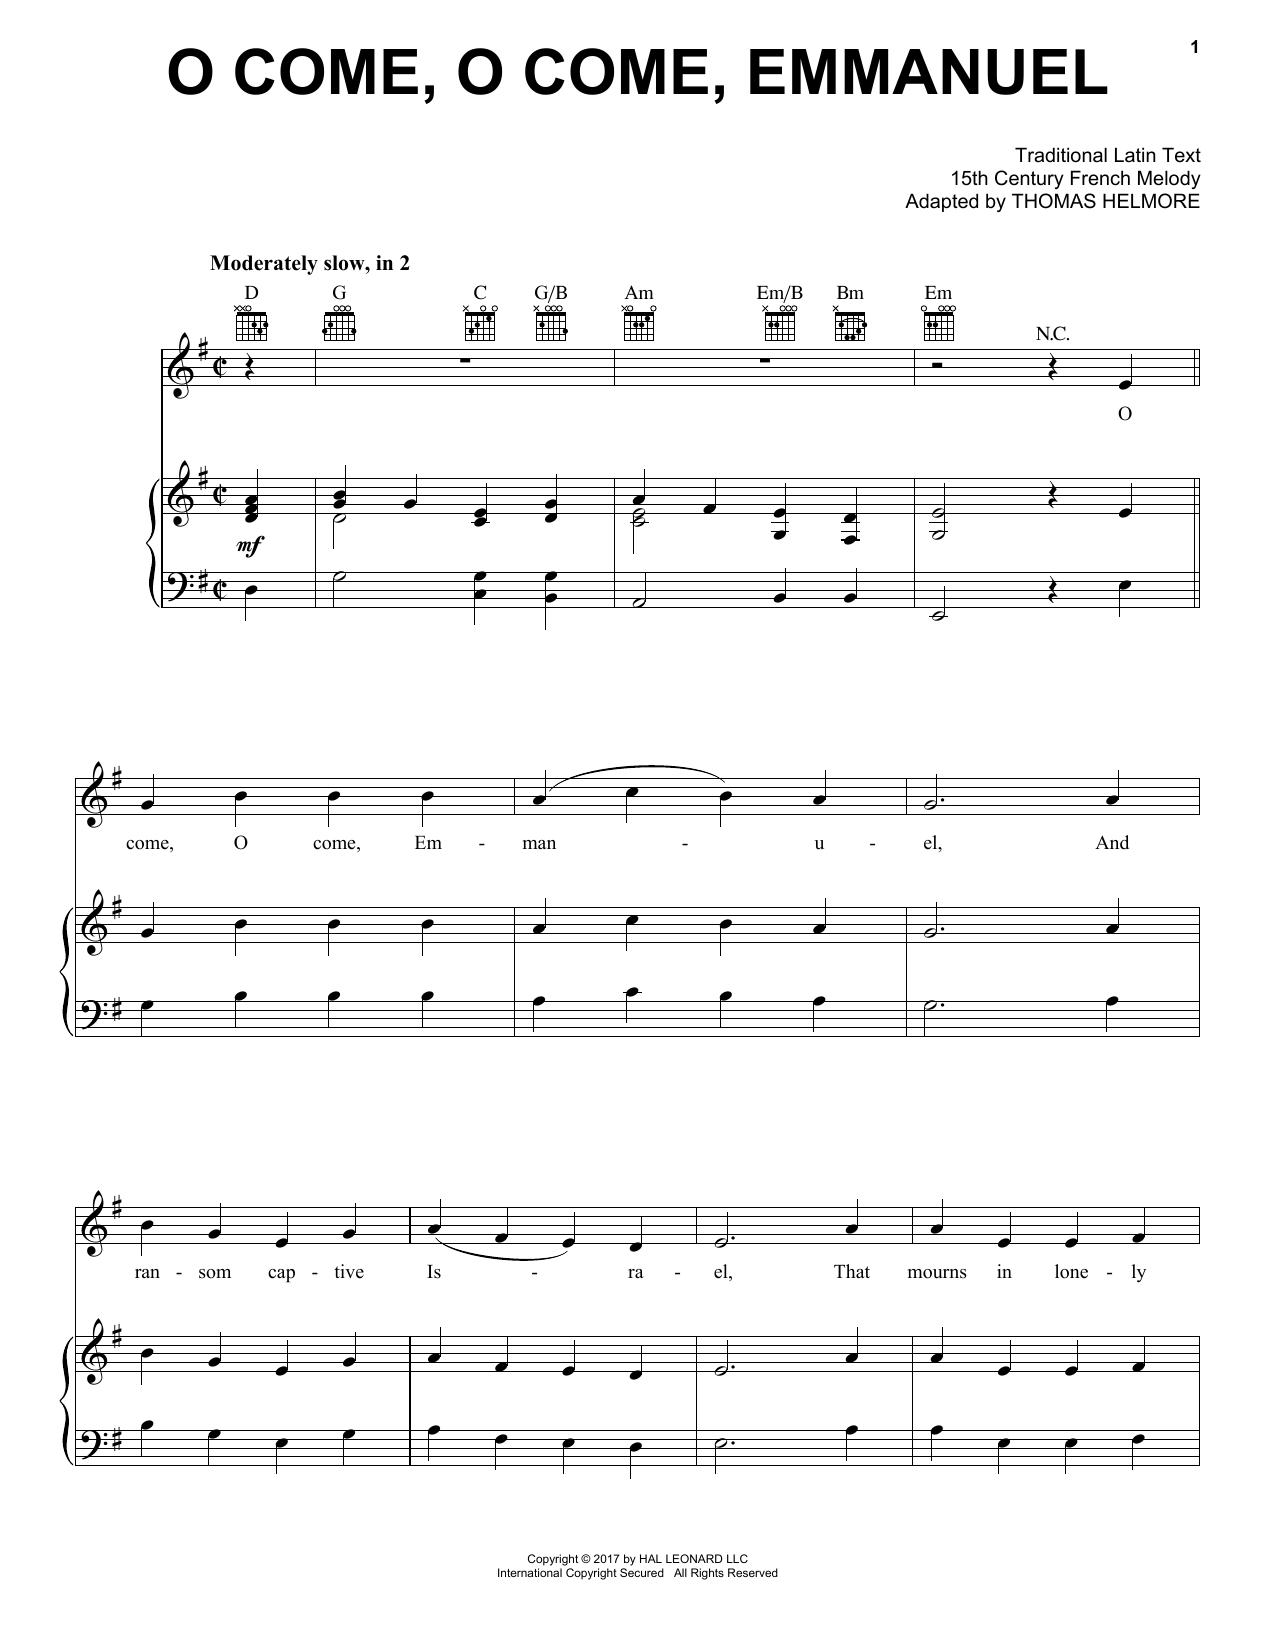 O Come, O Come, Emmanuel (Piano, Vocal & Guitar (Right-Hand Melody))